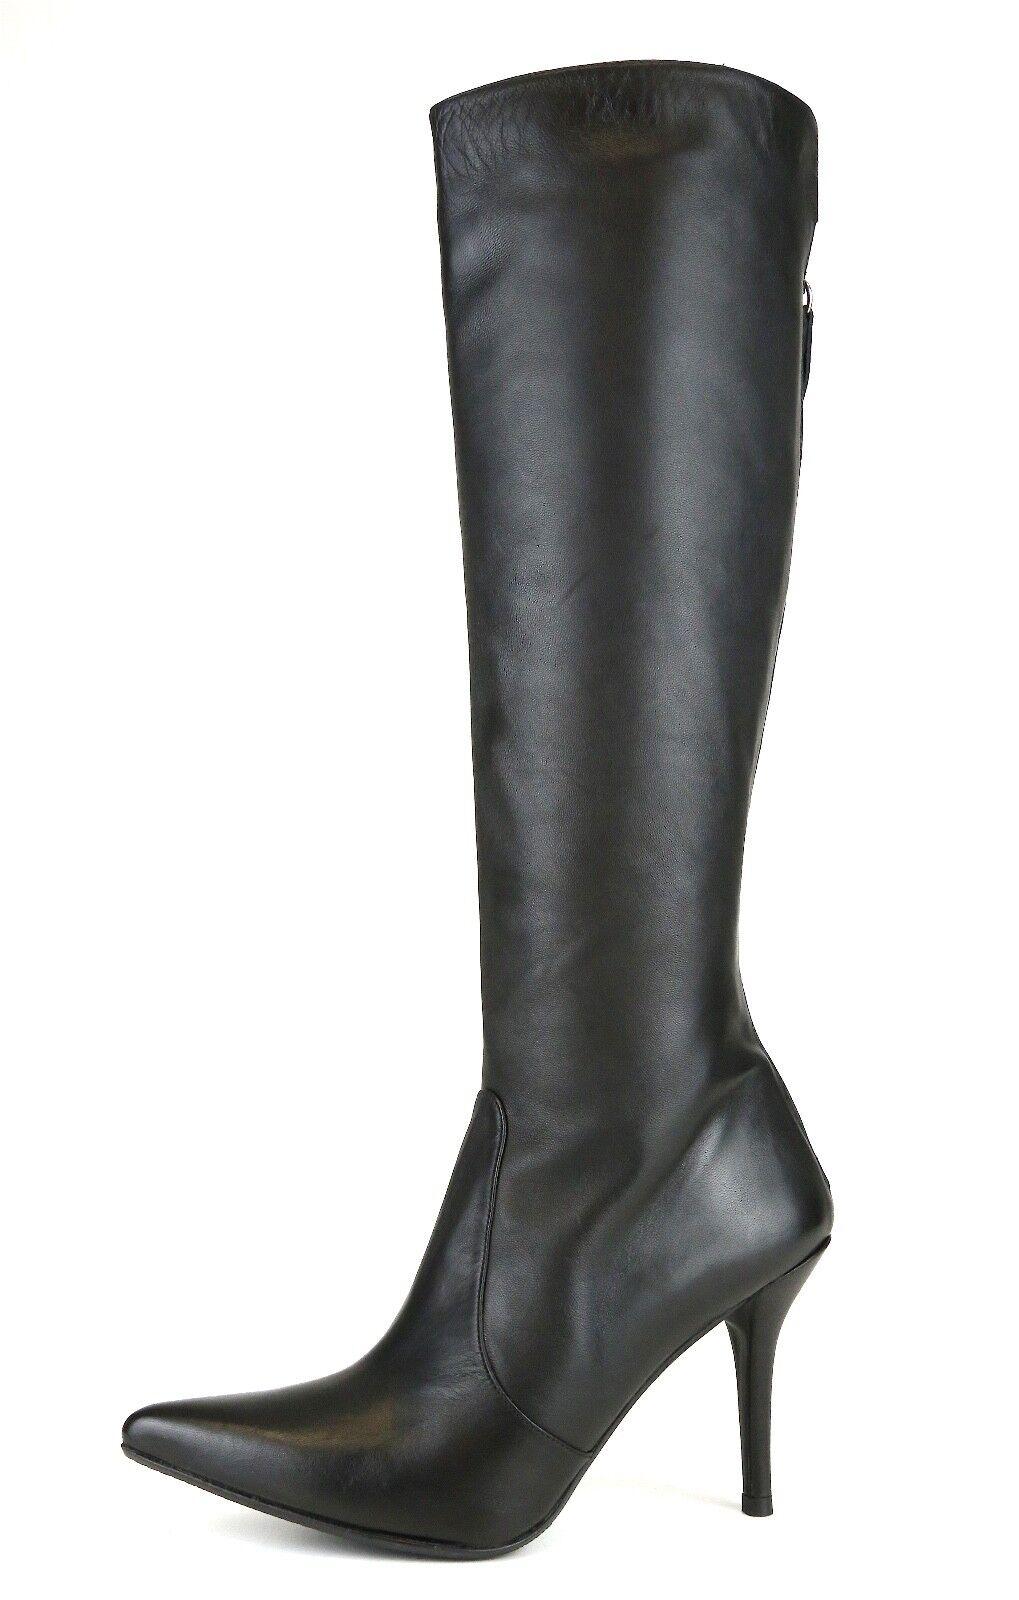 Stuart Weitzman Back Zip botas de cuero Negro Negro Negro para Mujeres Talla 6.5 M 1113  calidad auténtica